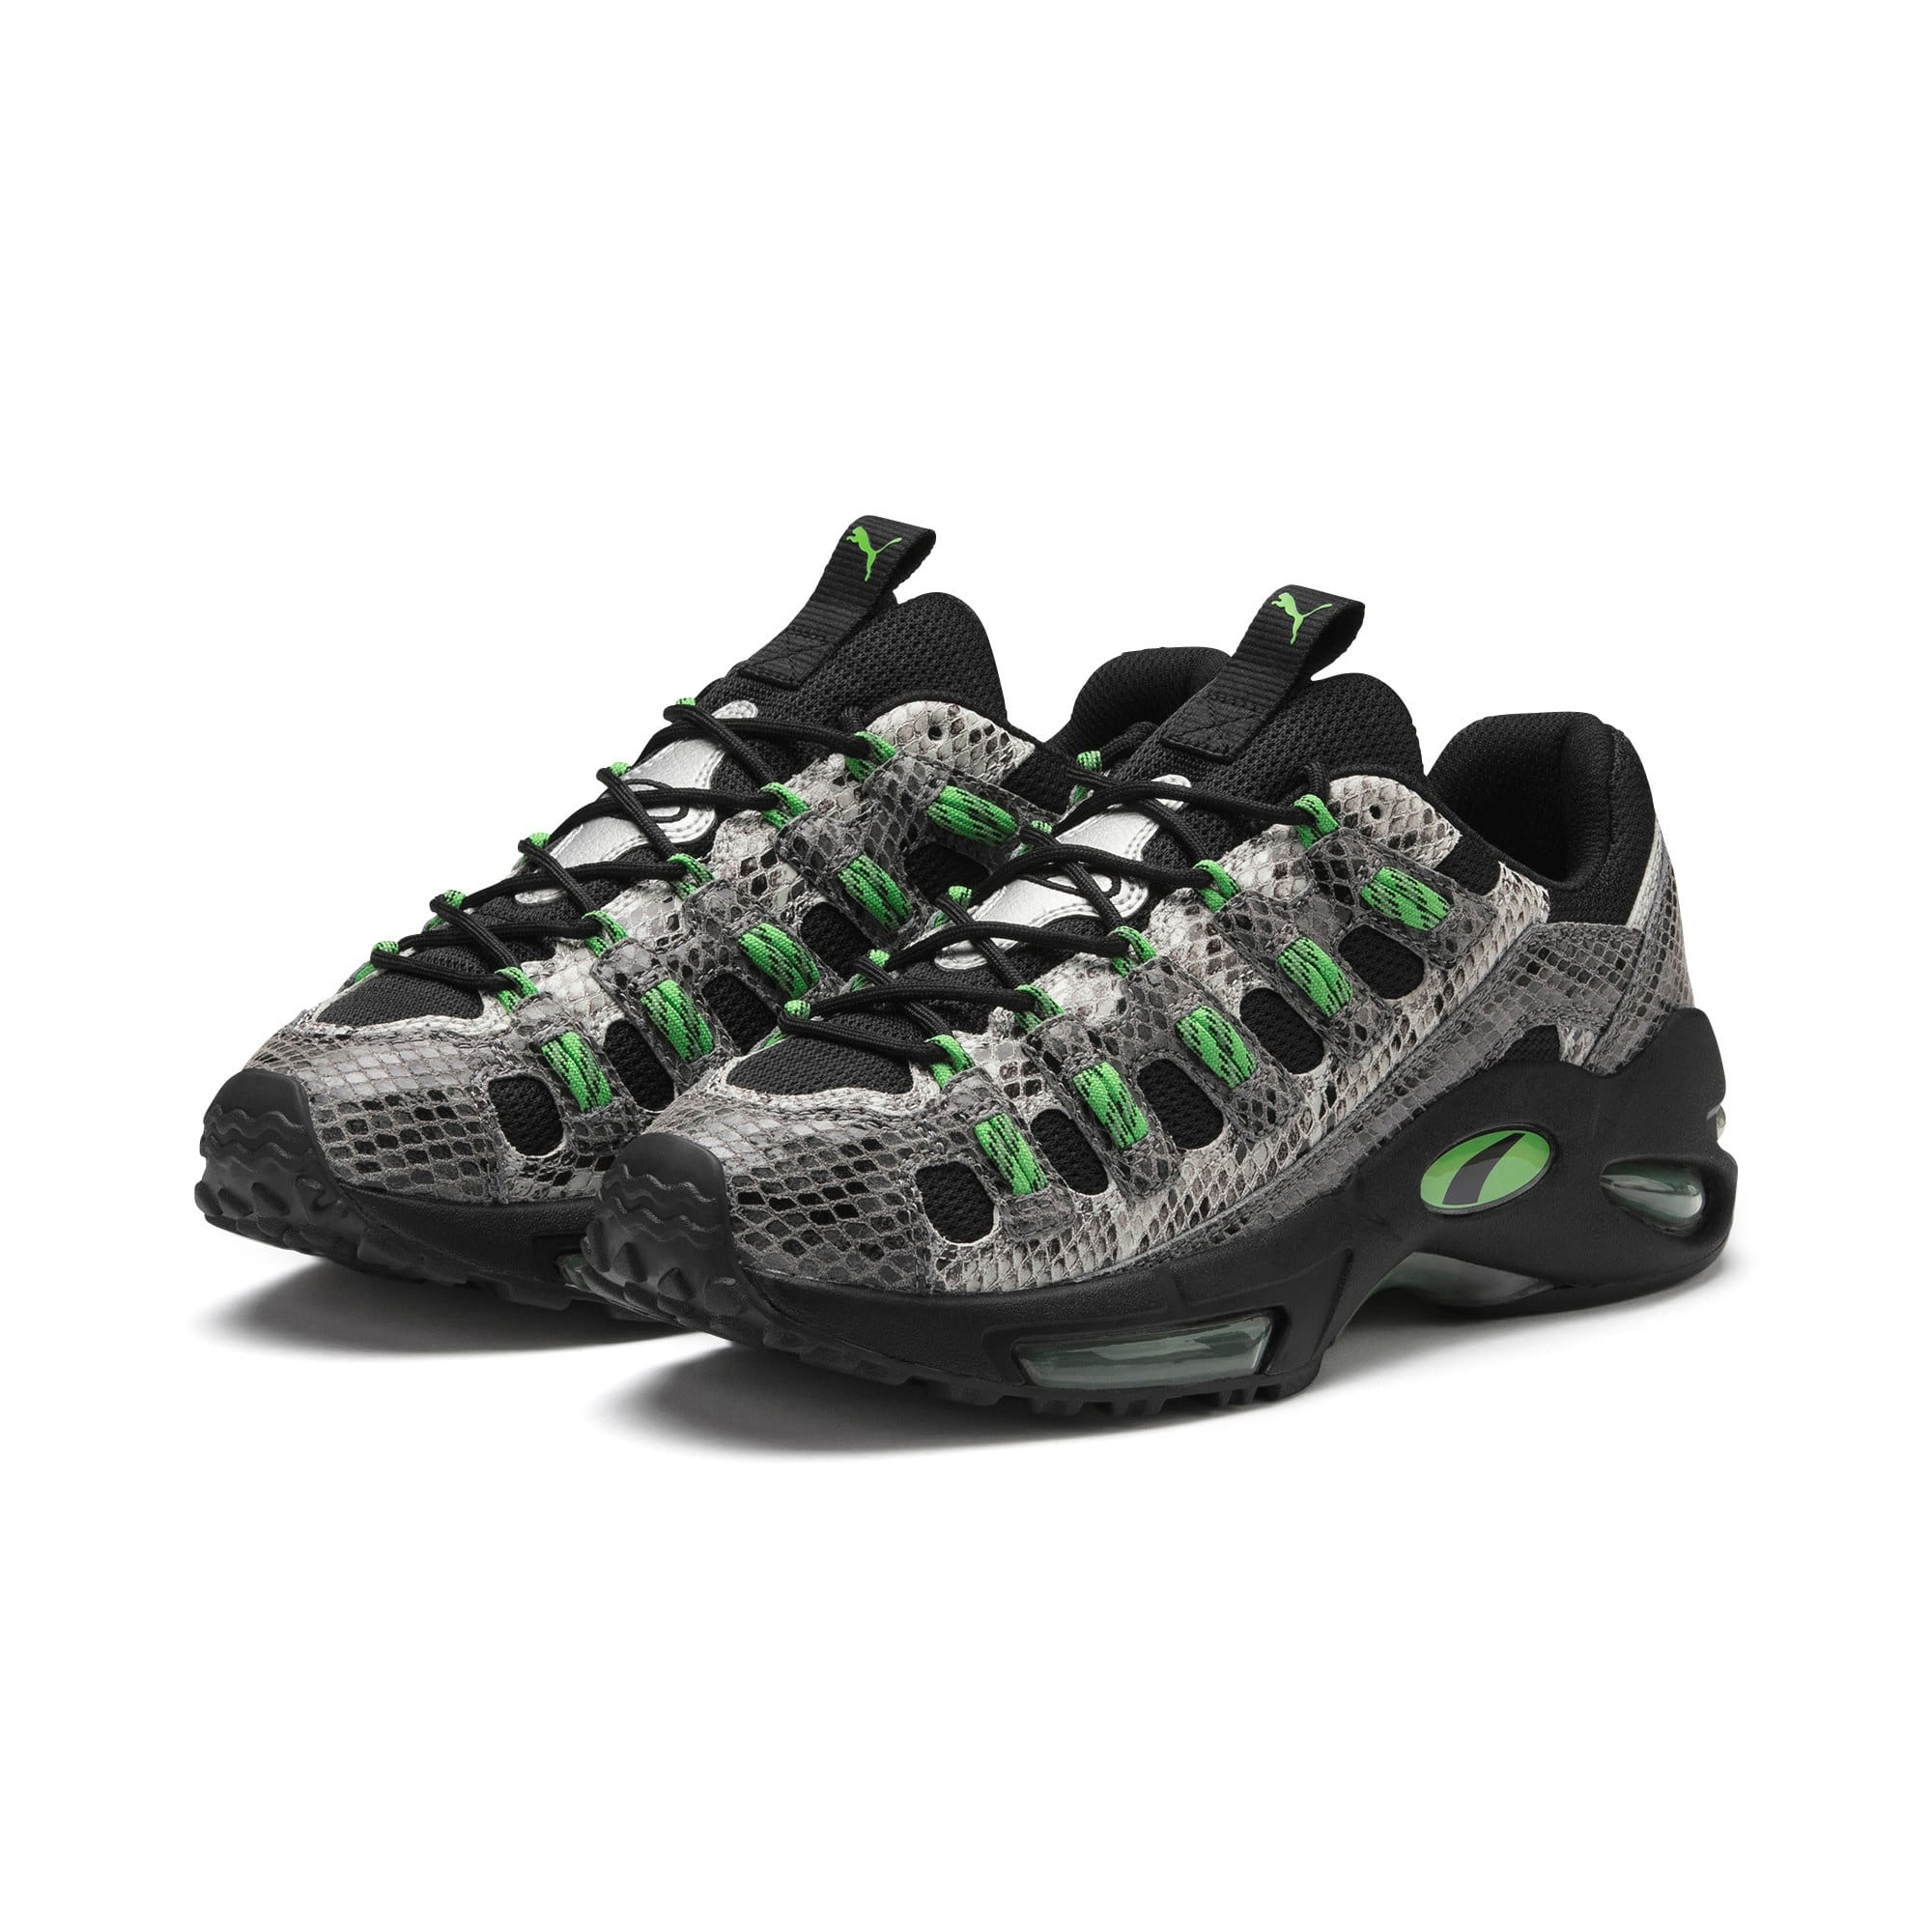 Thumbnail 3 of CELL Endura Animal Kingdom Sneakers, Puma Black-Classic Green, medium